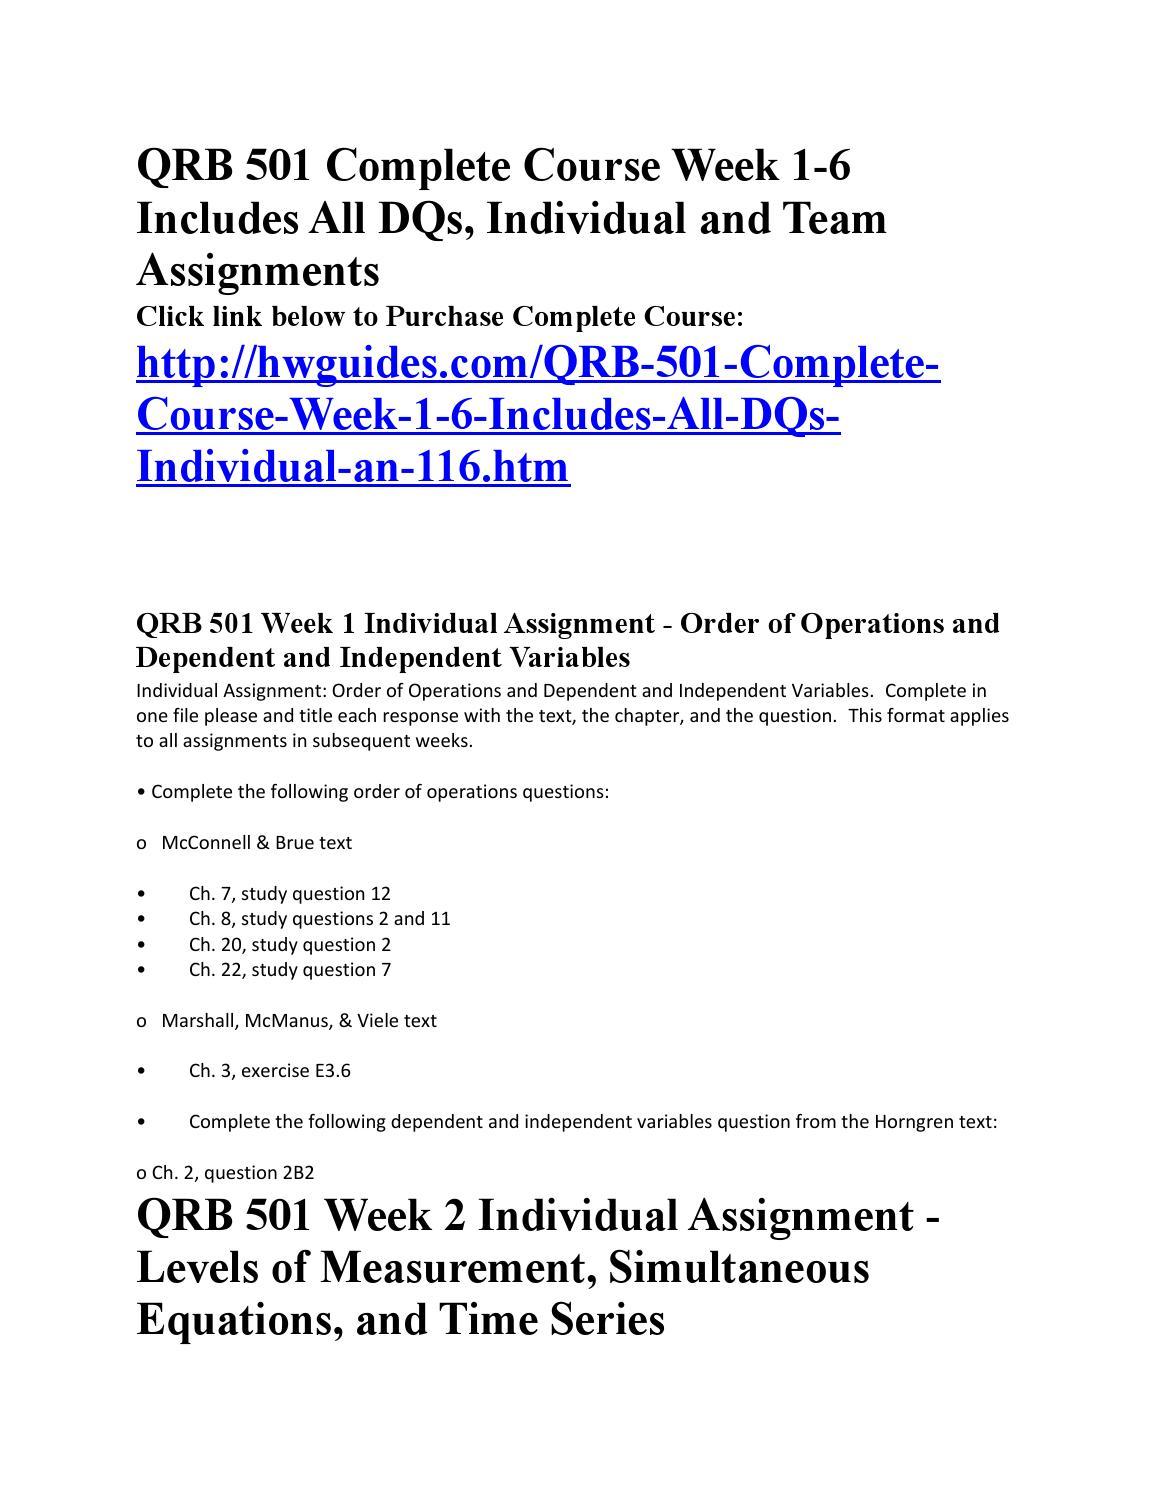 qrb501 questions